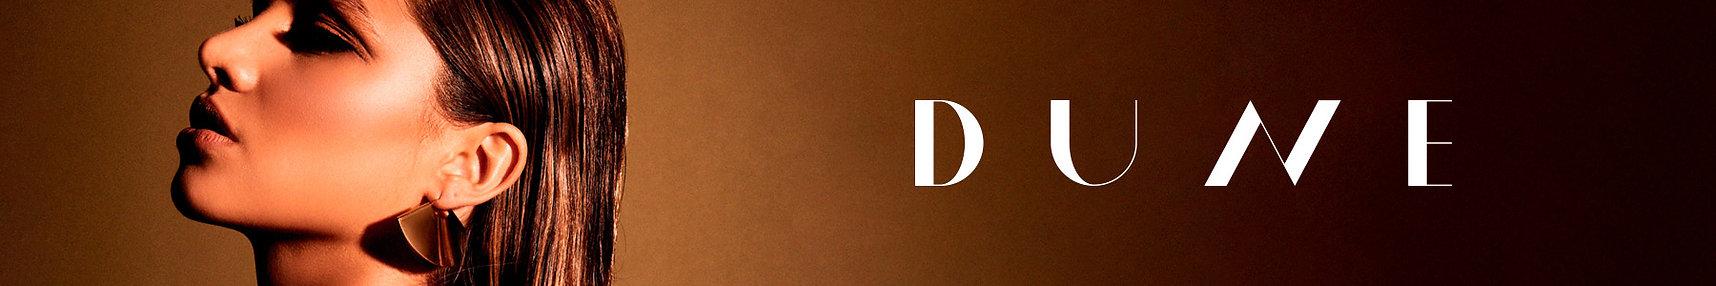 Banner colección DUNE iconique.jpg